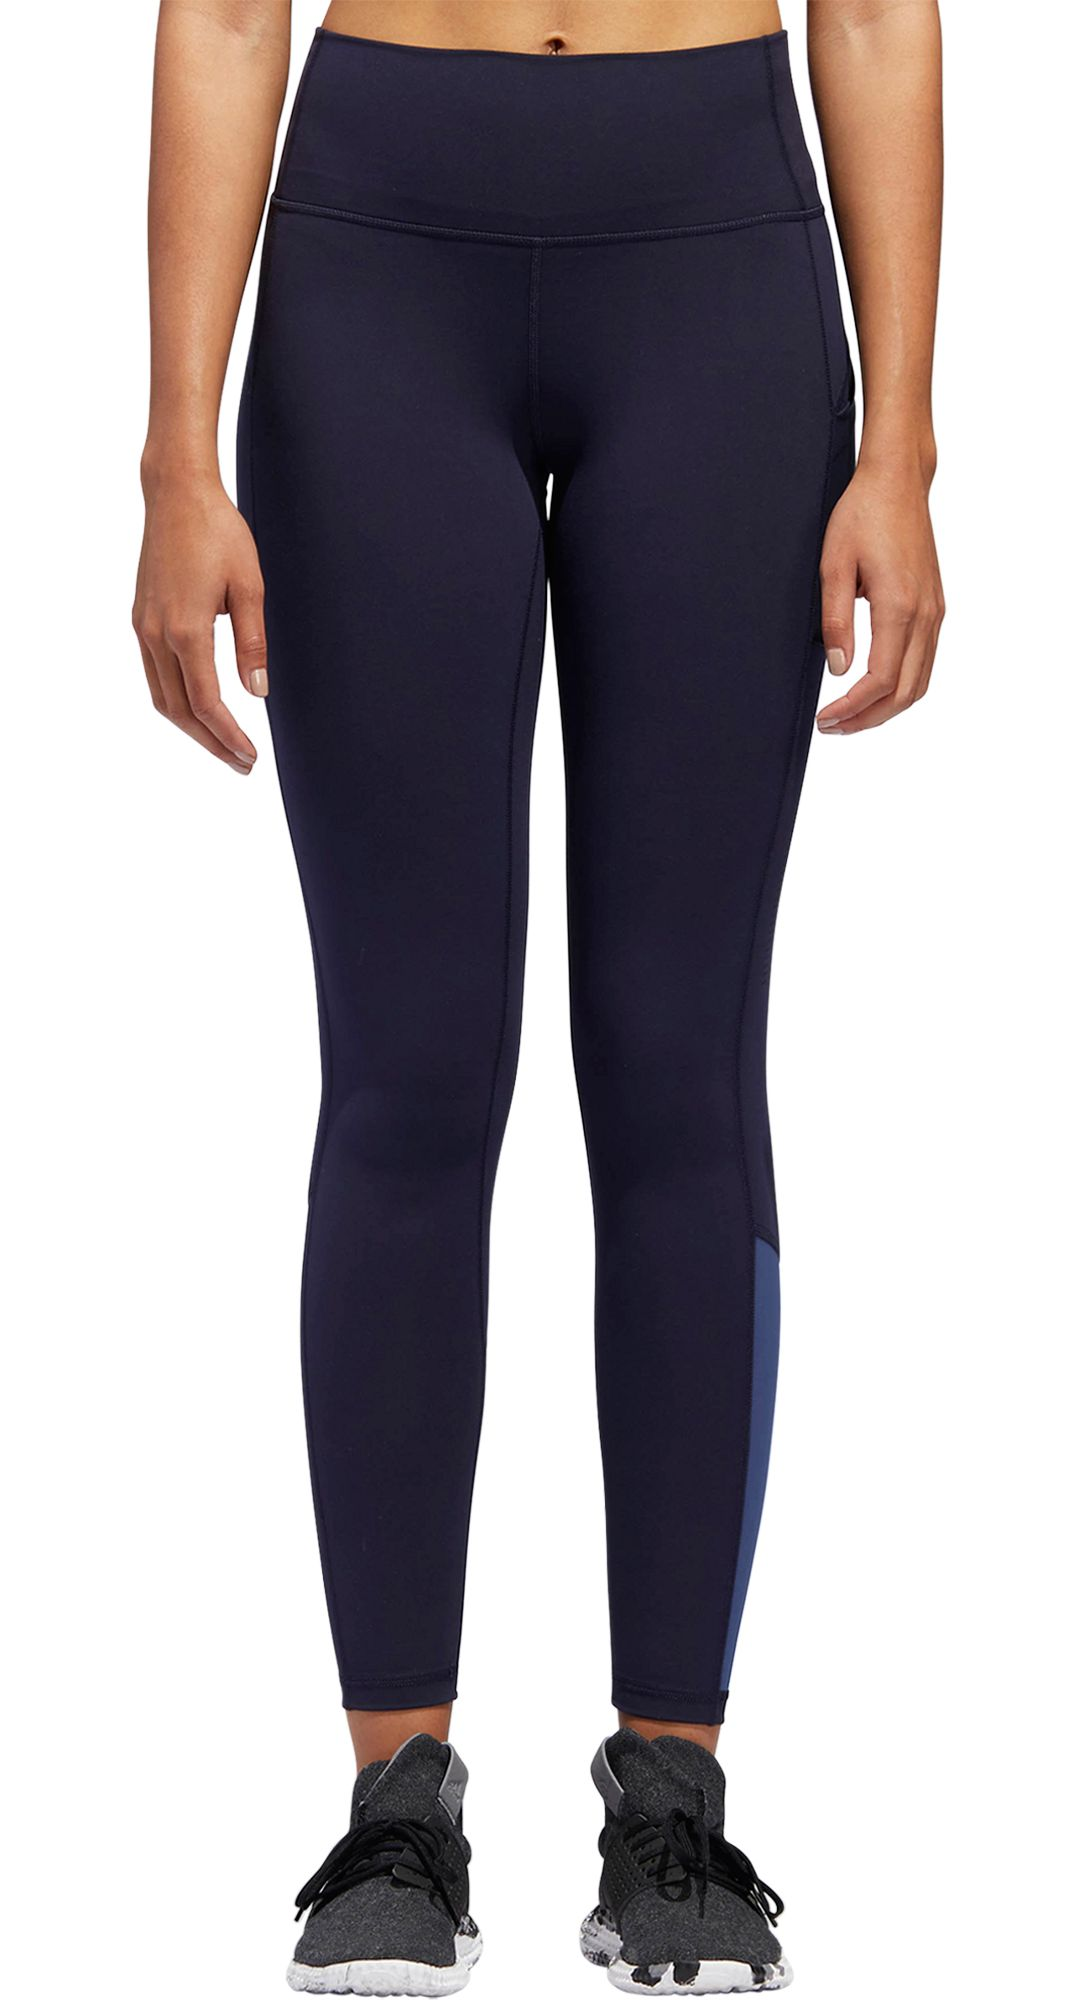 171e4abdfbb21 adidas Women's Believe This HR 7/8 Laser Focus Leggings | DICK'S ...